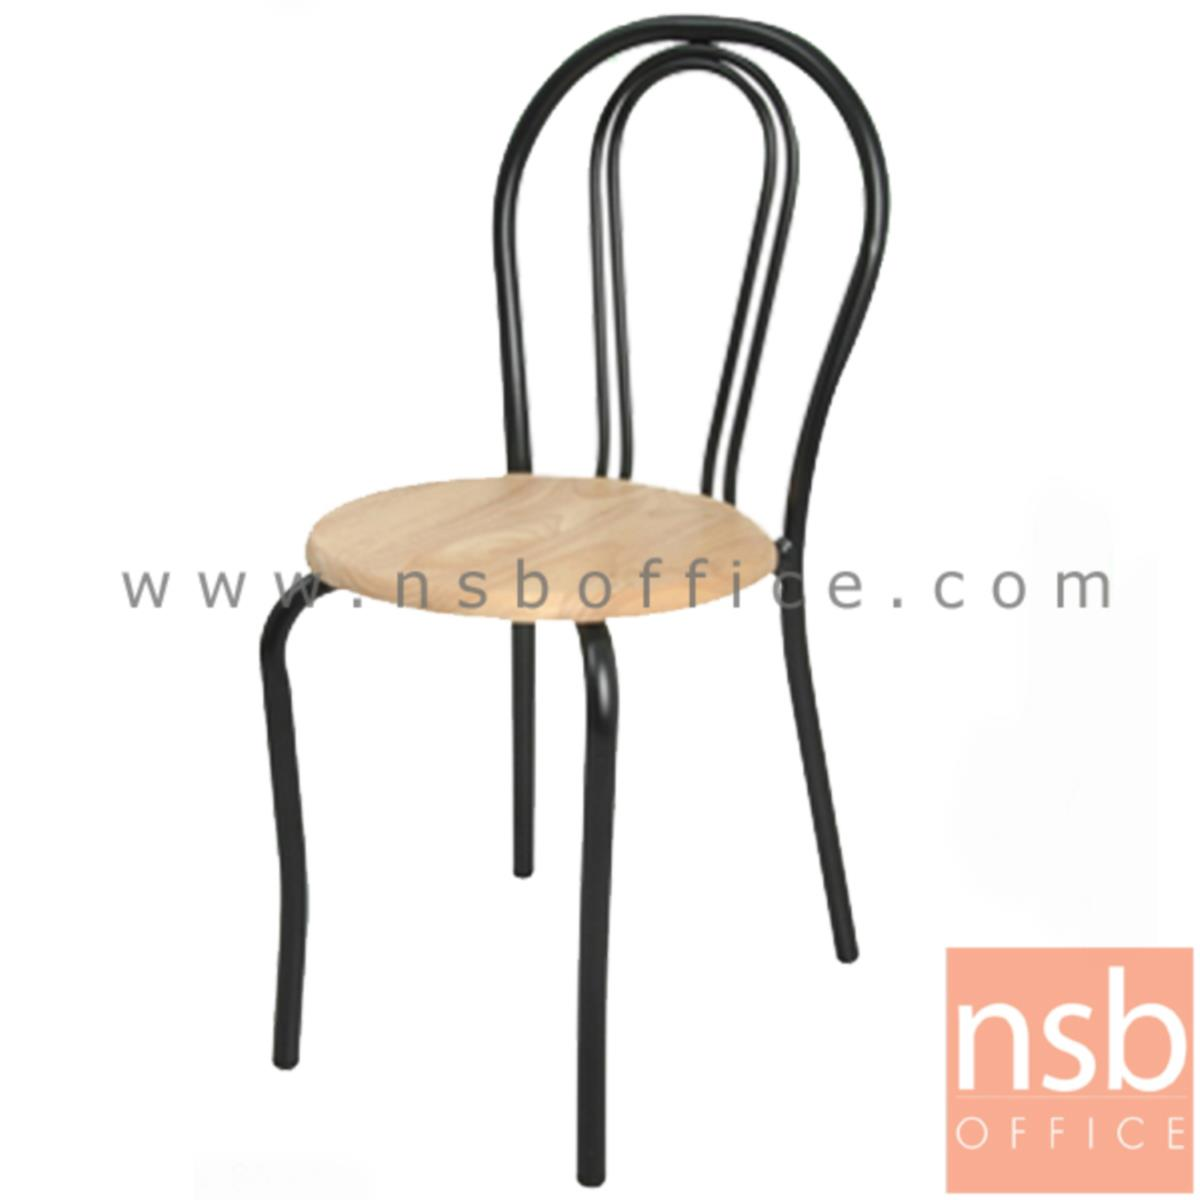 B20A044:เก้าอี้อเนกประสงค์เหล็ก รุ่น FRESHY-BW  ขาเหล็กพ่นดำ